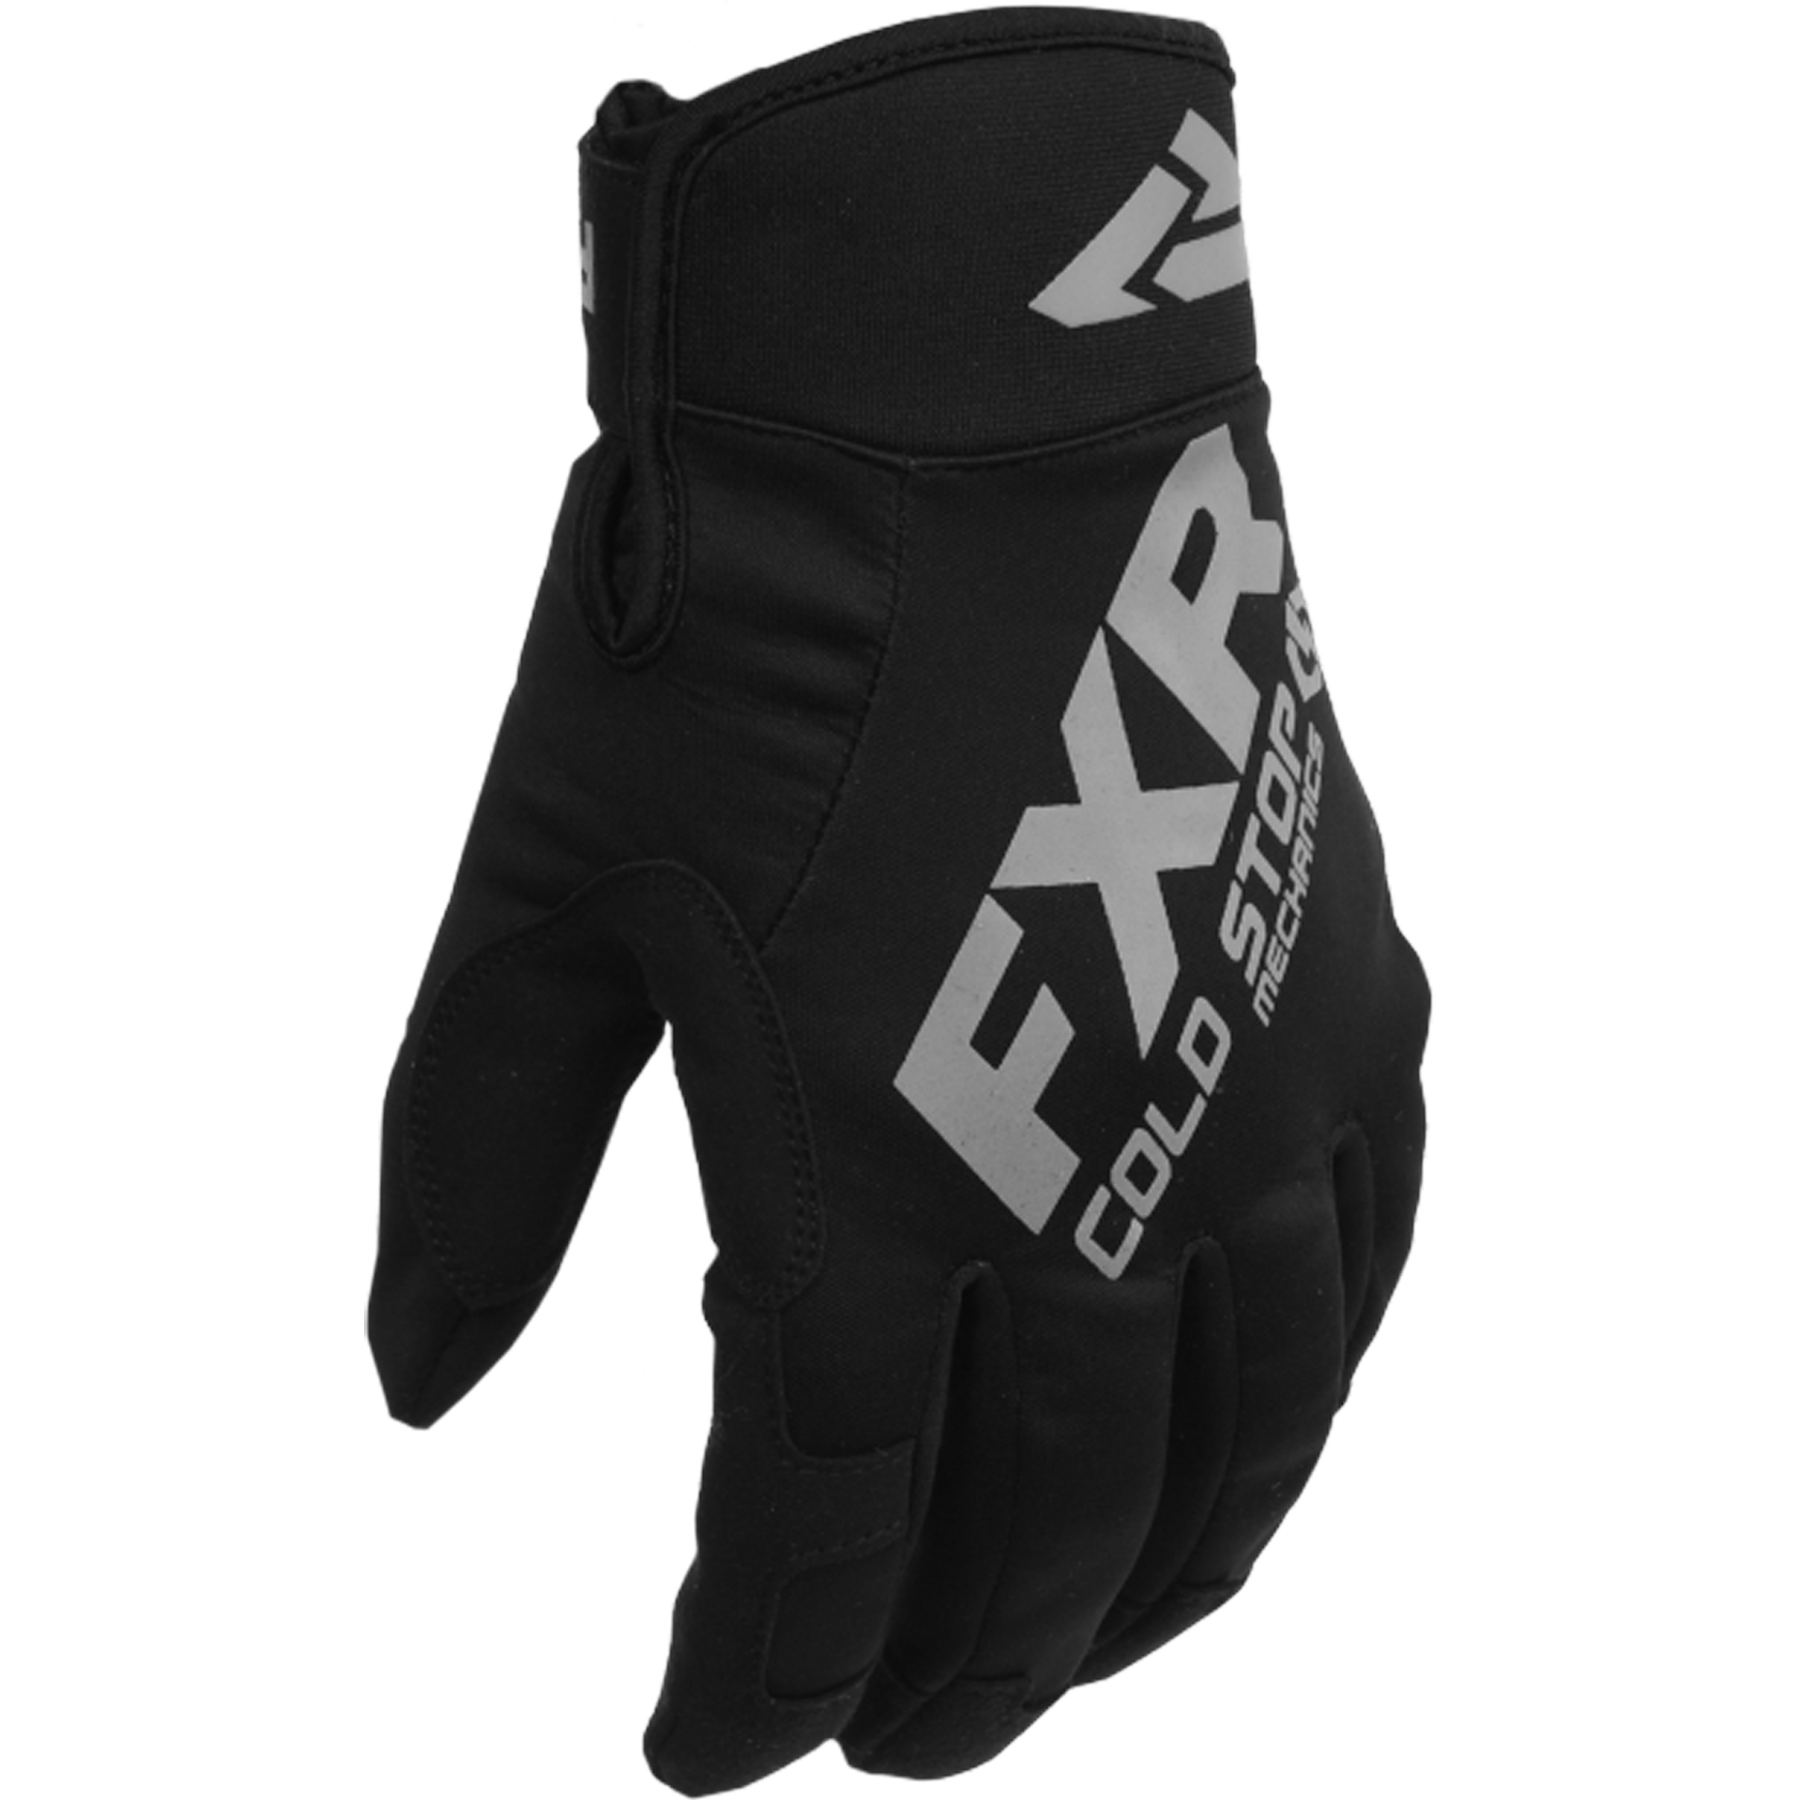 Cold Stop Mechanics Glove 22 KI 3